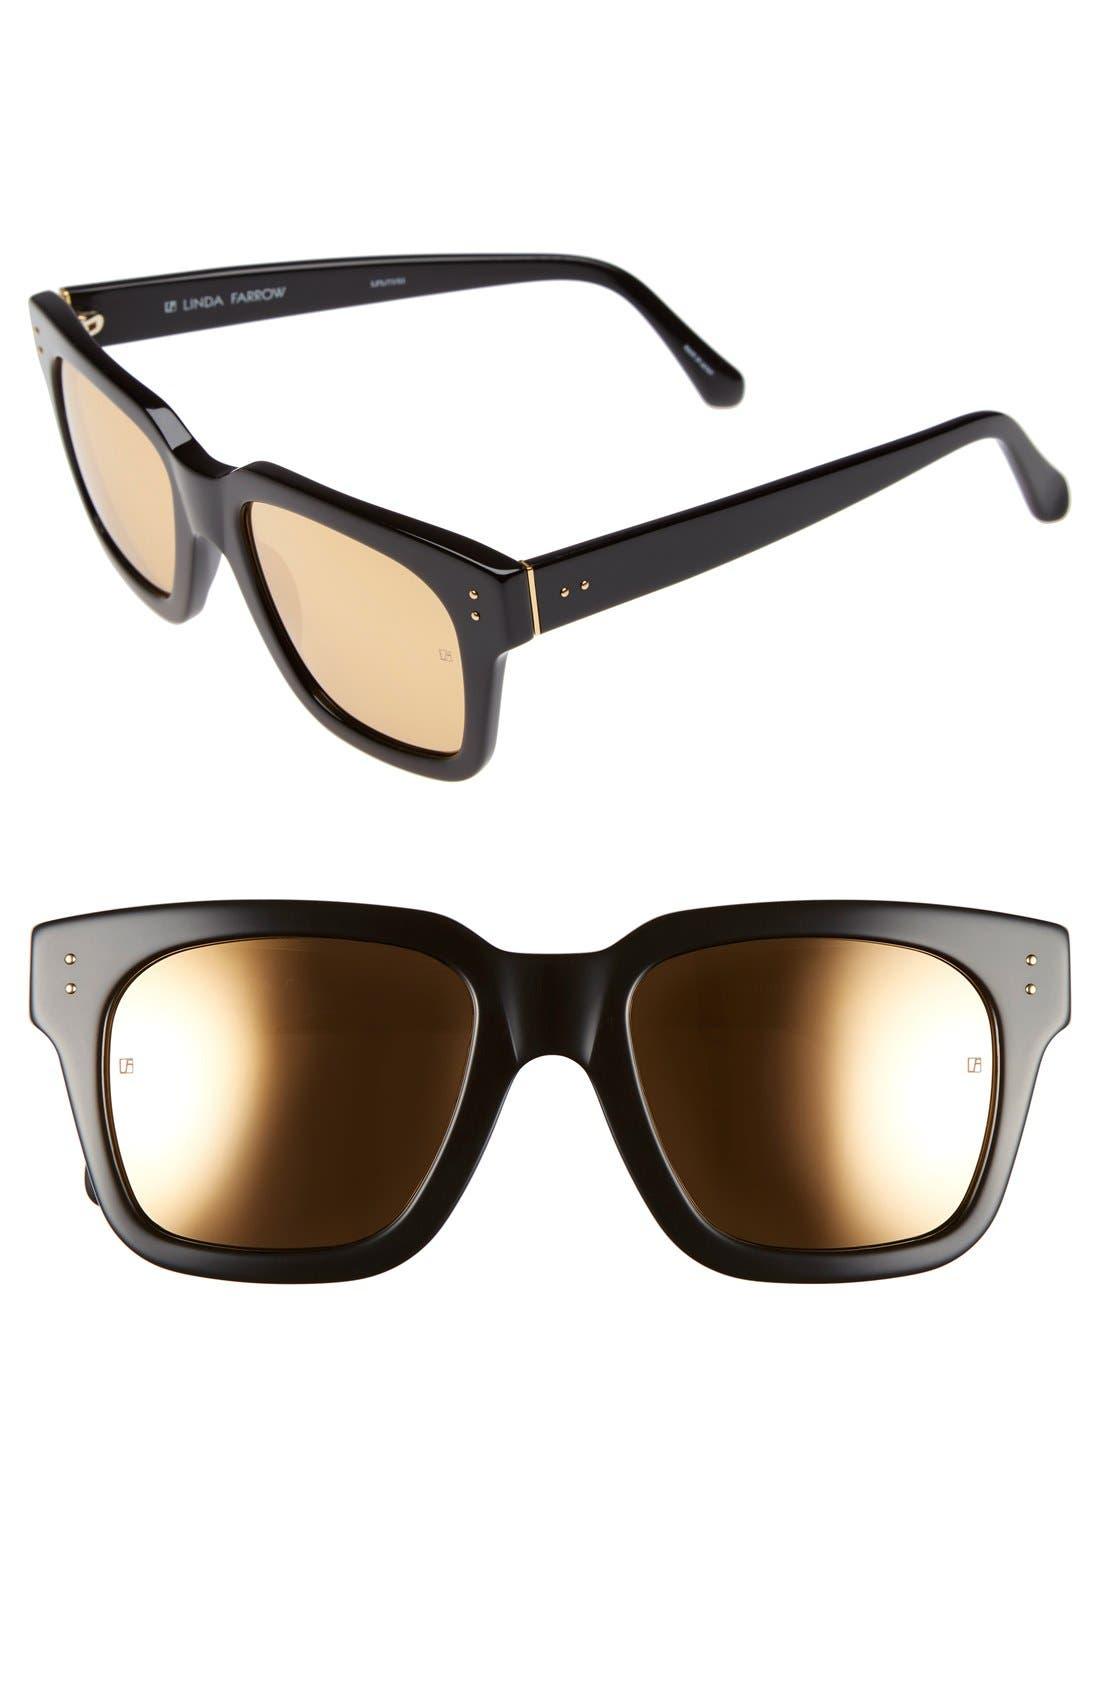 LINDA FARROW D-Frame 52mm Mirrored Lens Sunglasses